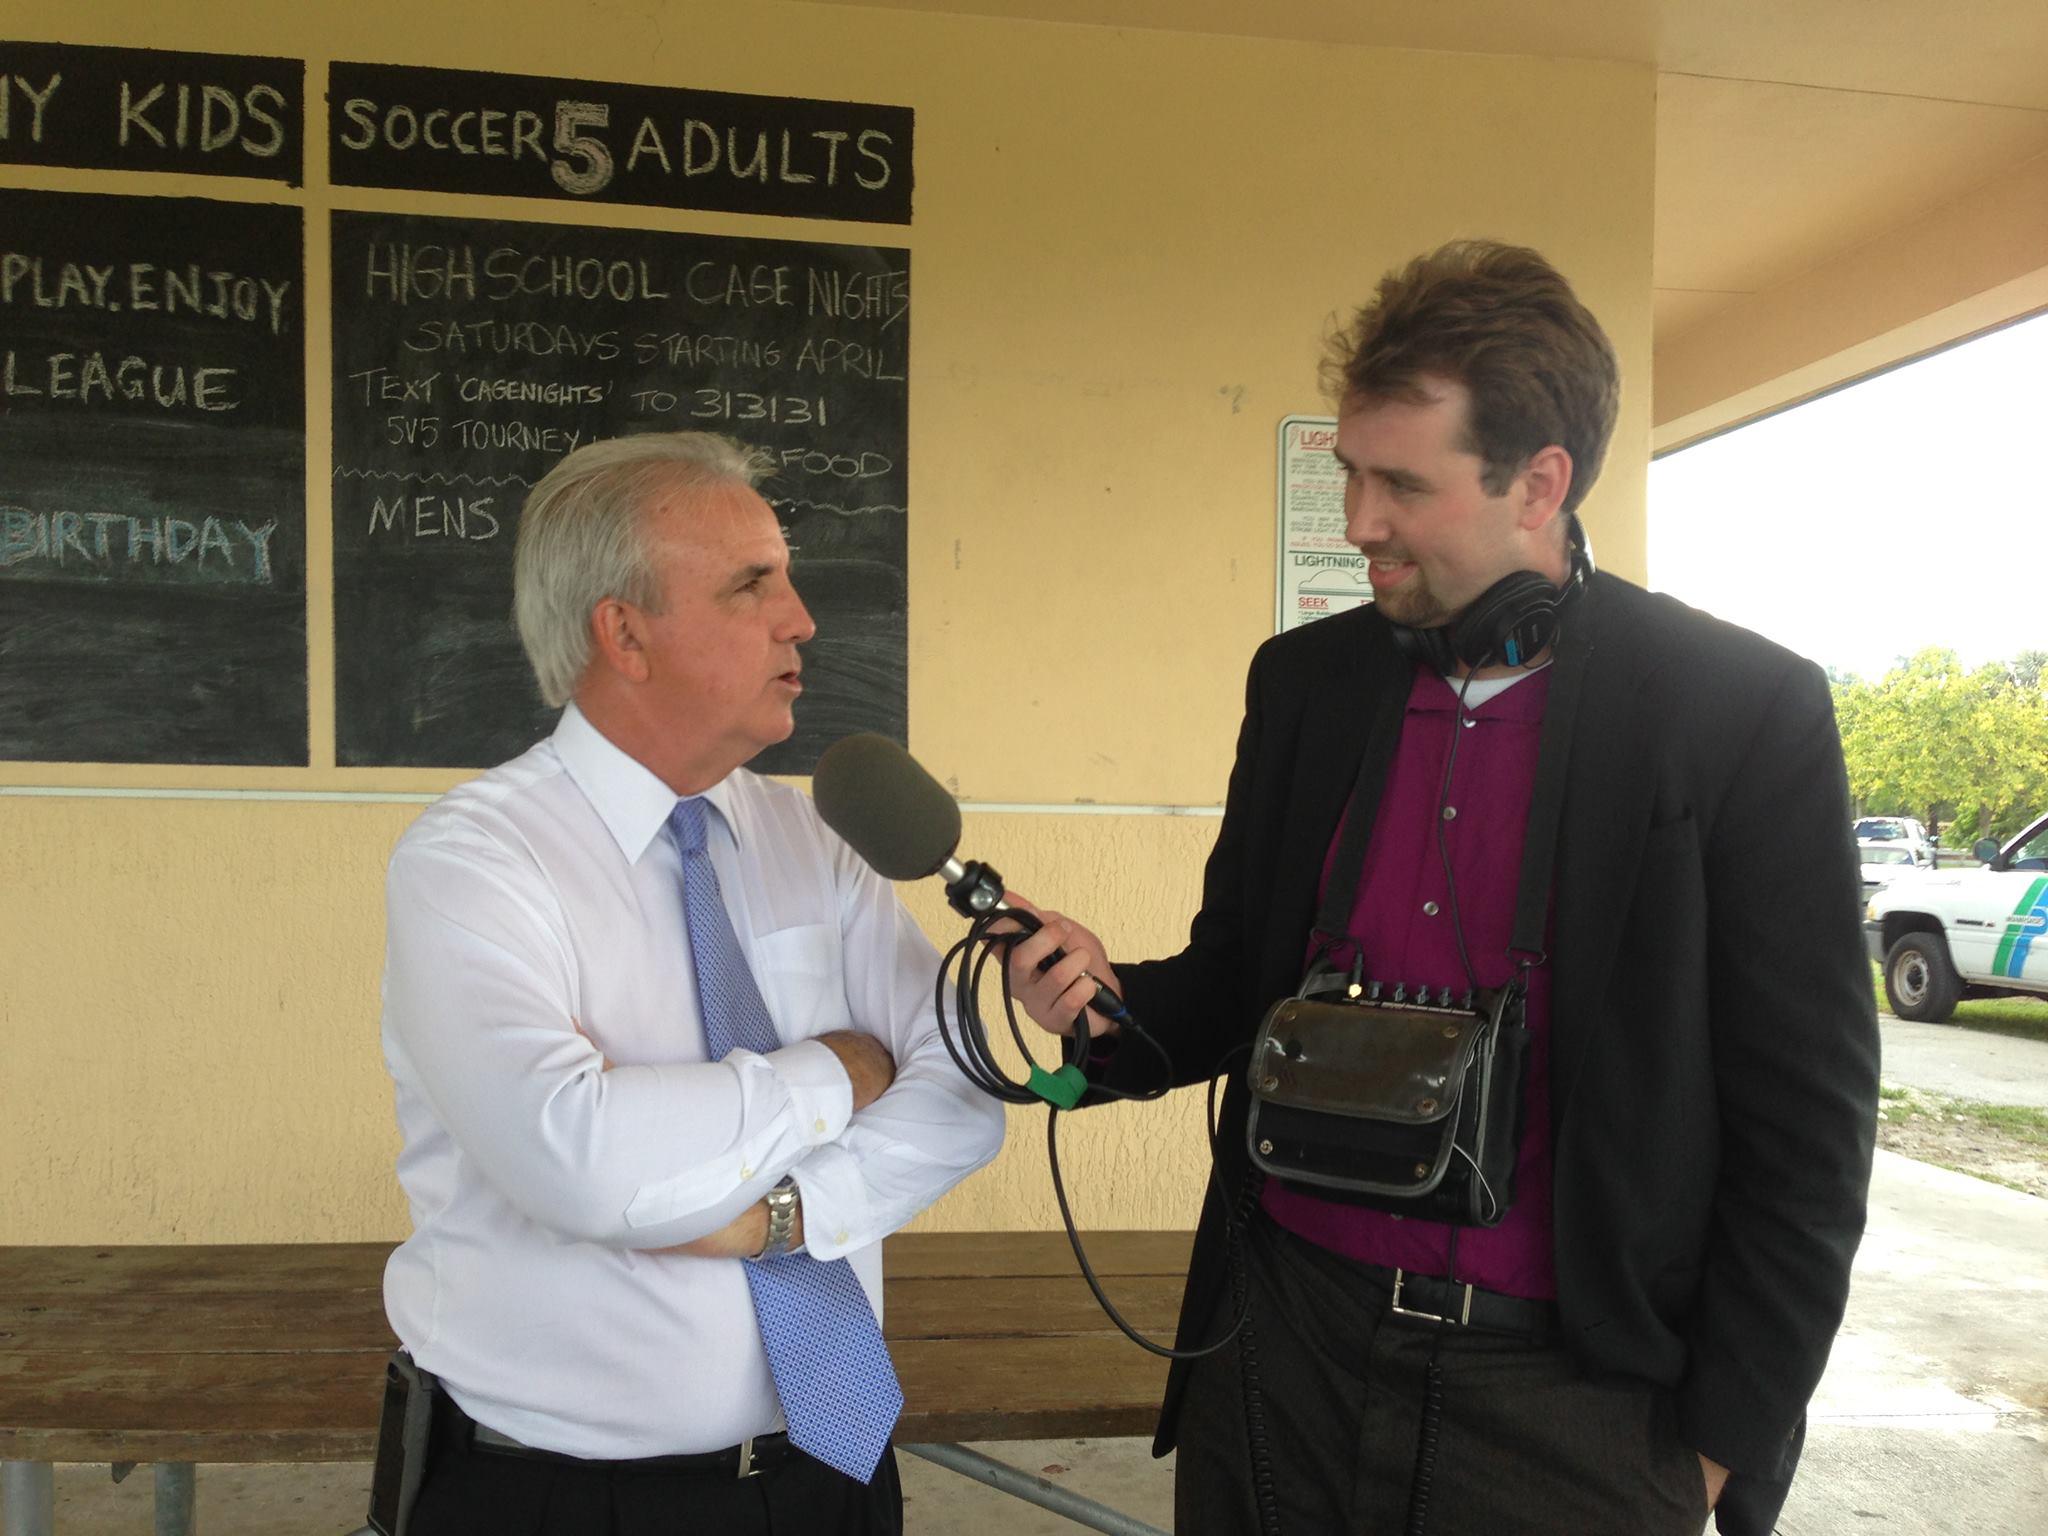 Jesse McQuarters interviewing Miami-Dade Co. Mayor Carlos Gimenez